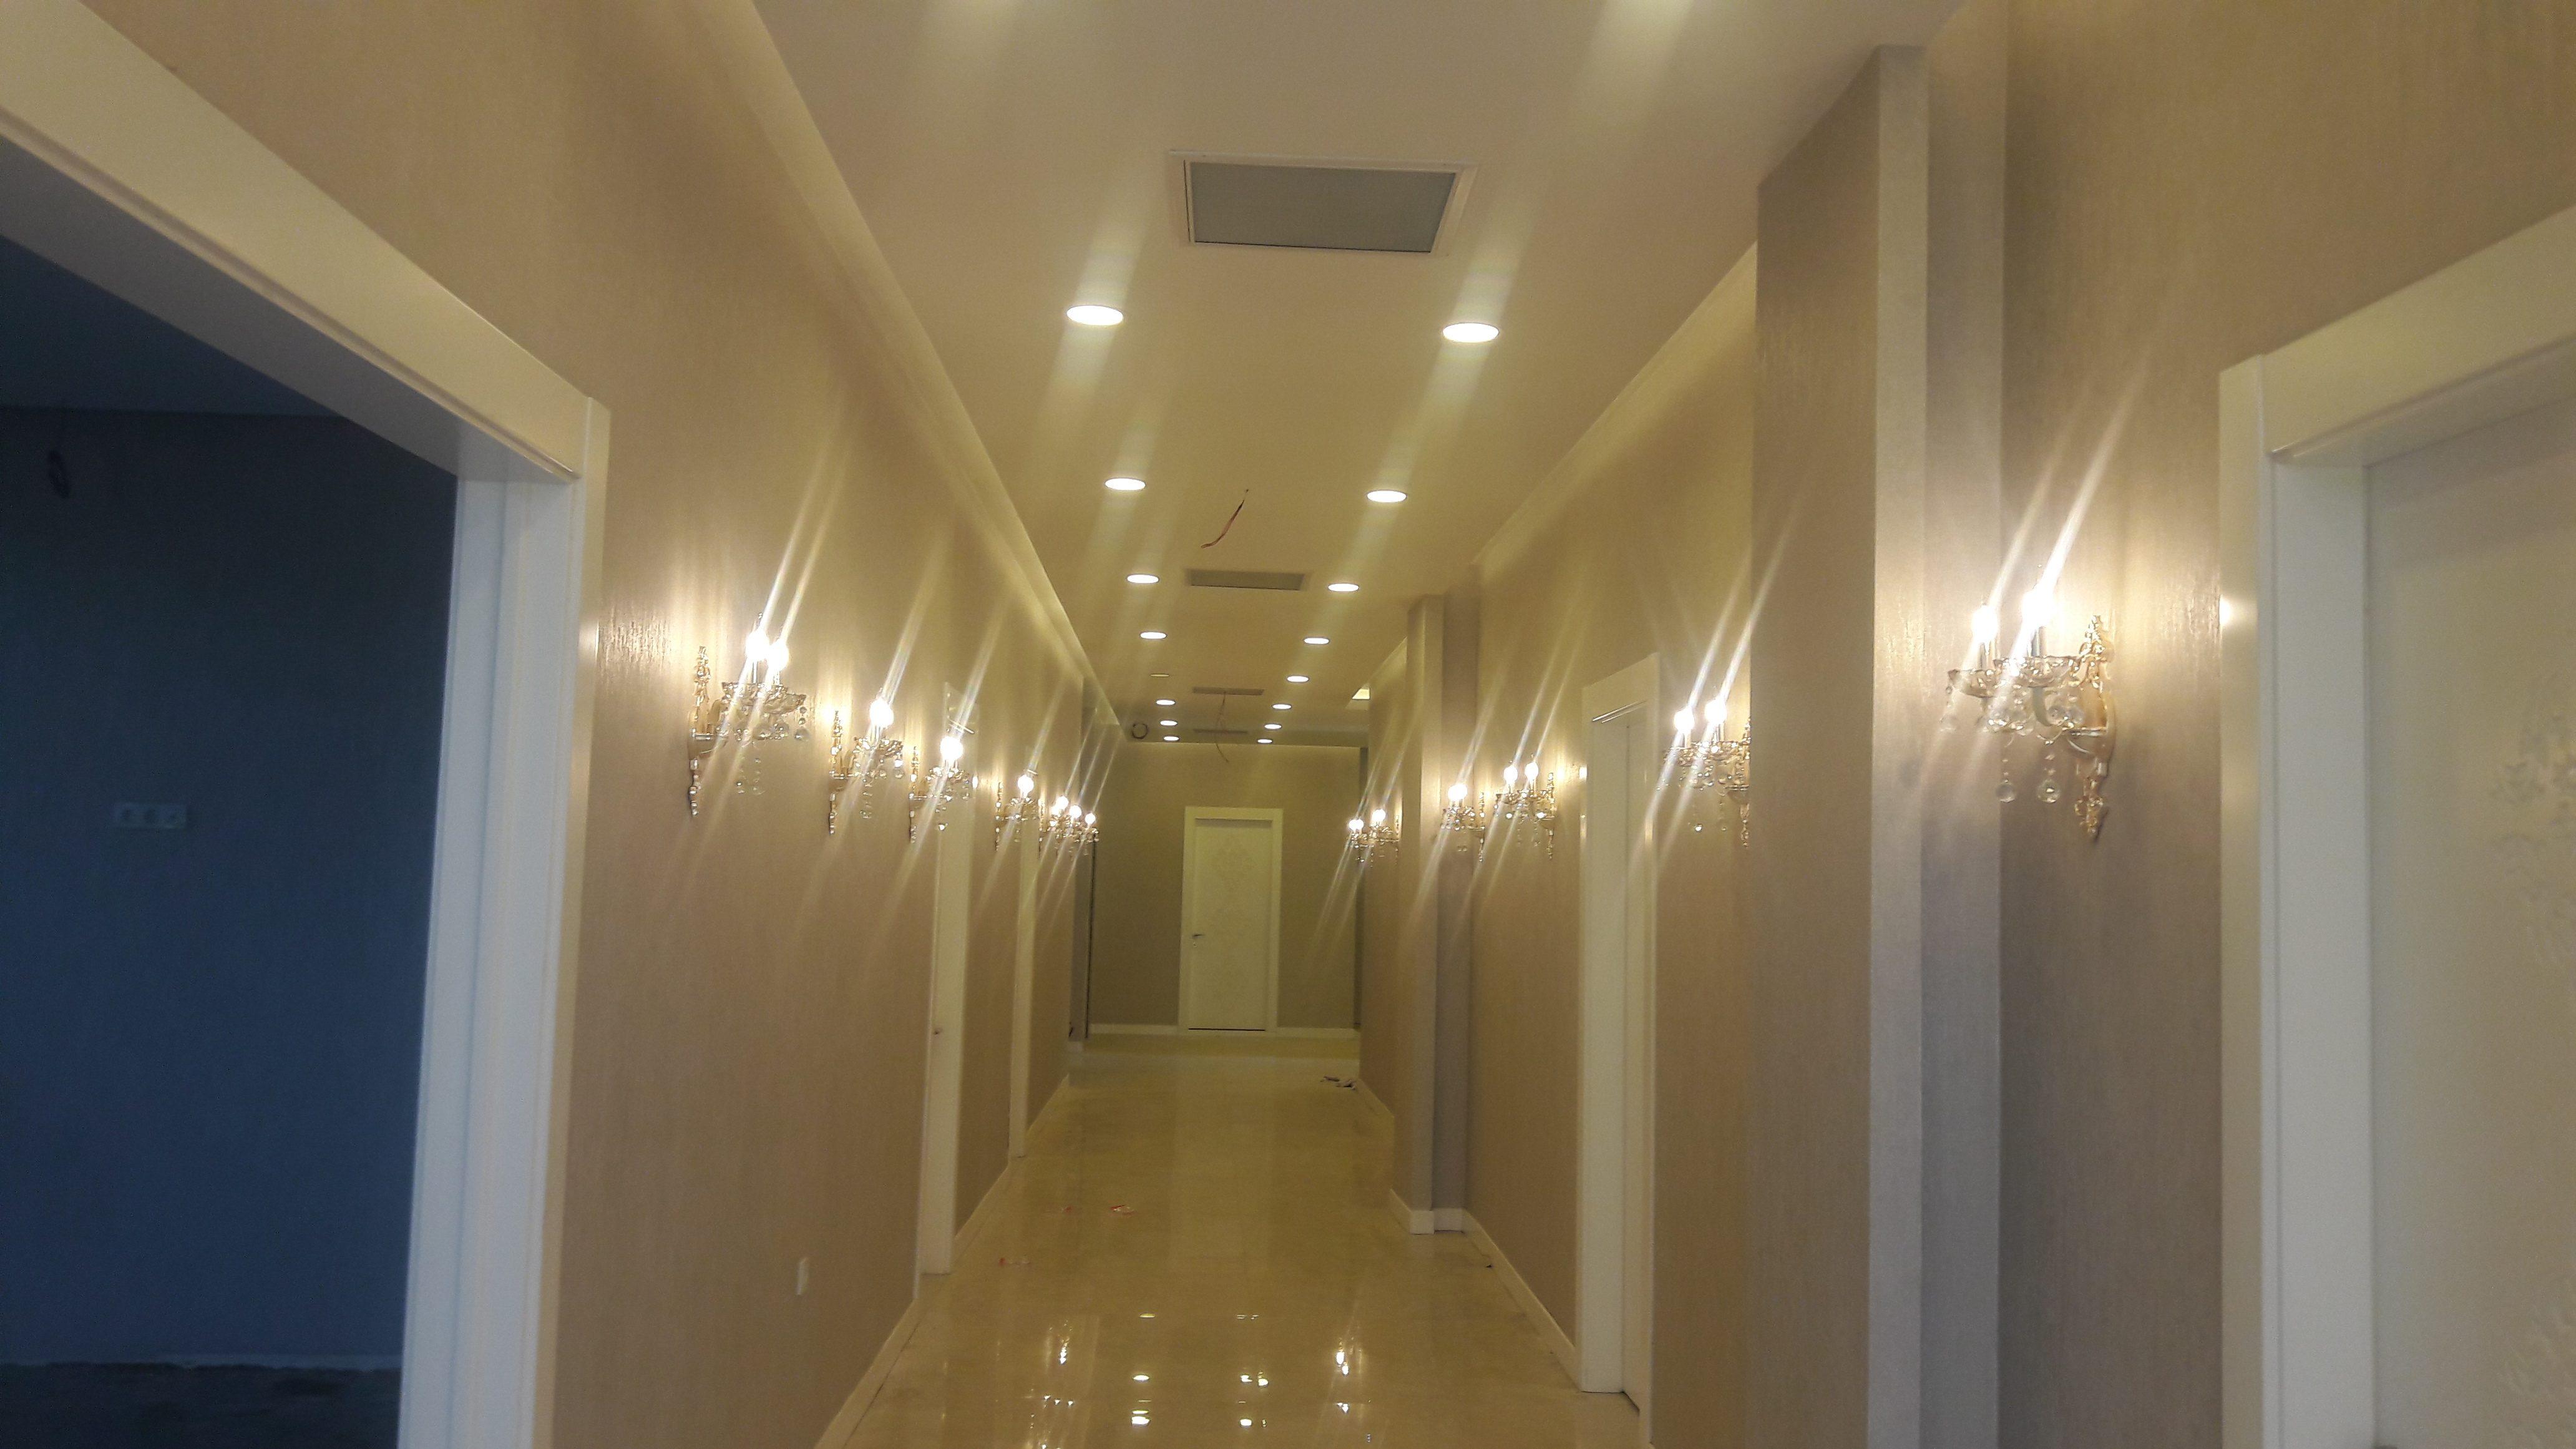 Lüks otel koridor modelleri